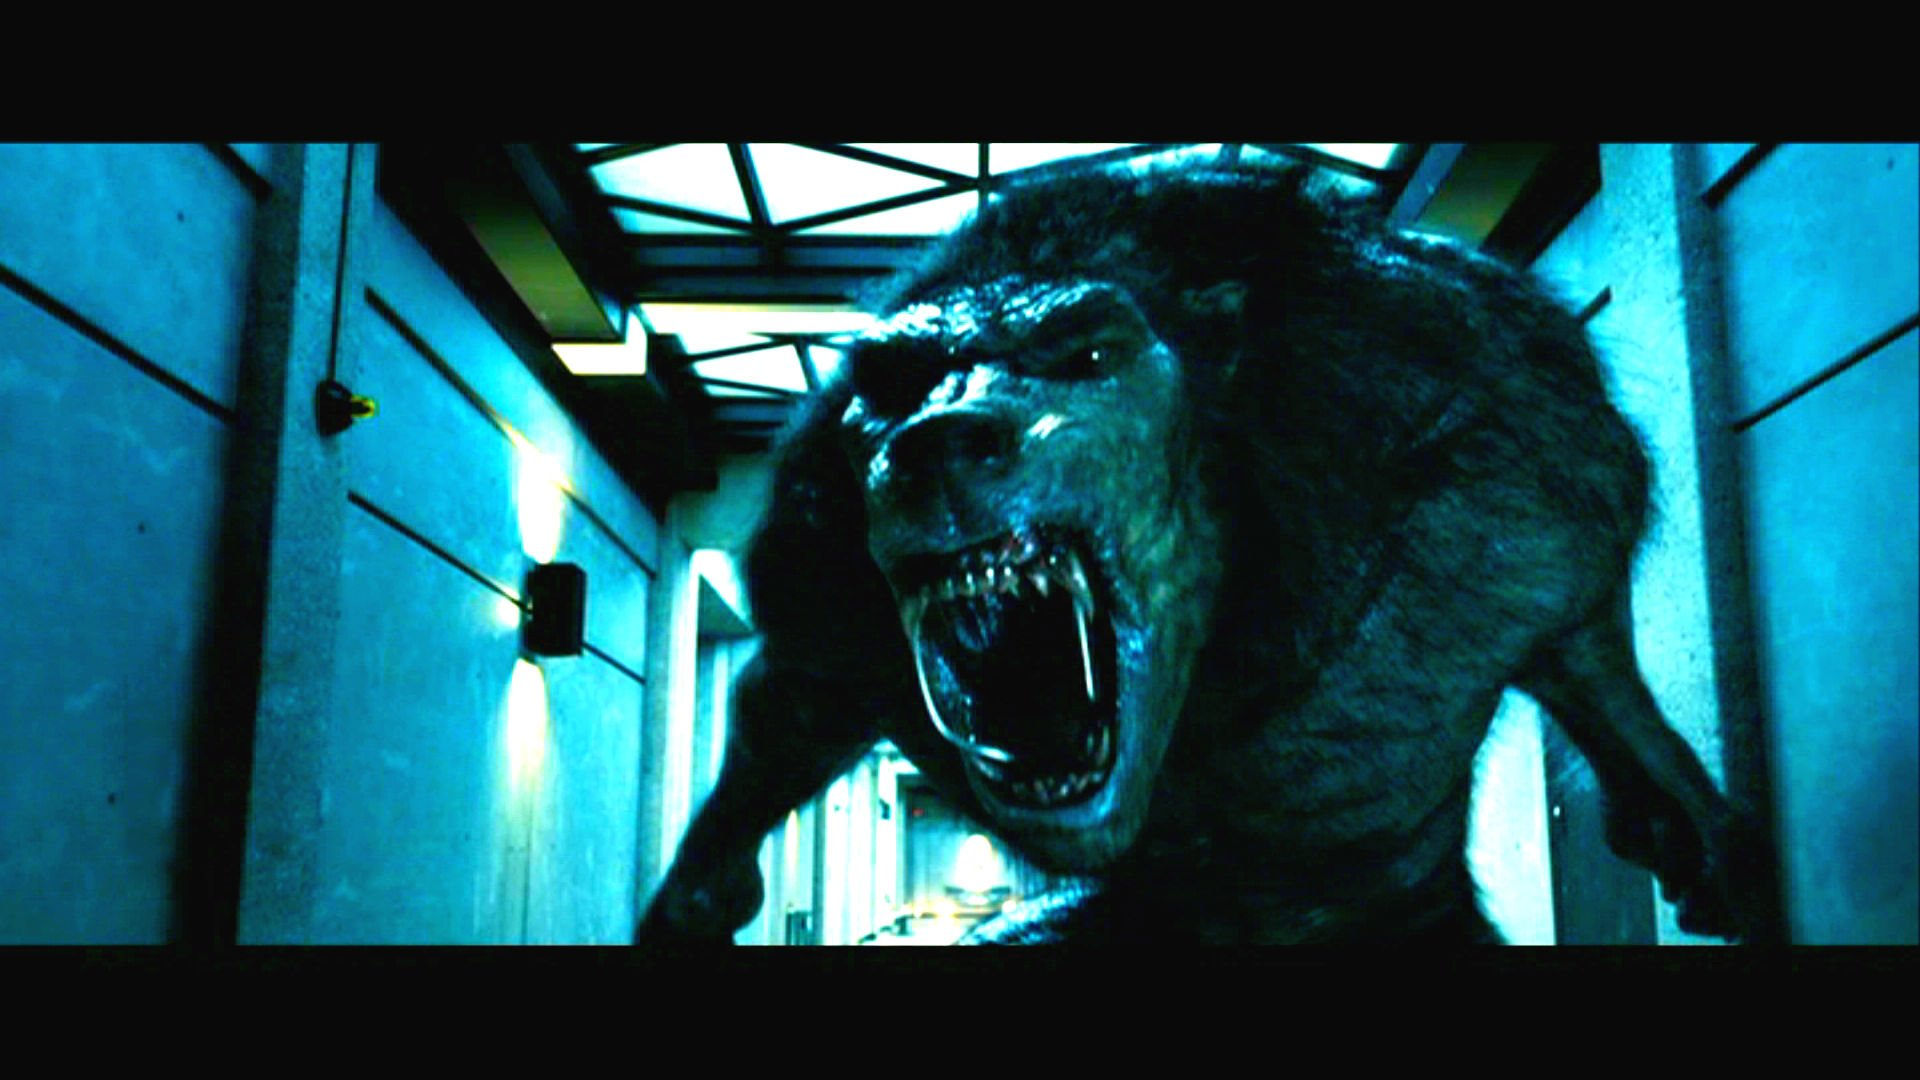 underworld werewolf wallpaper wallpapersafari